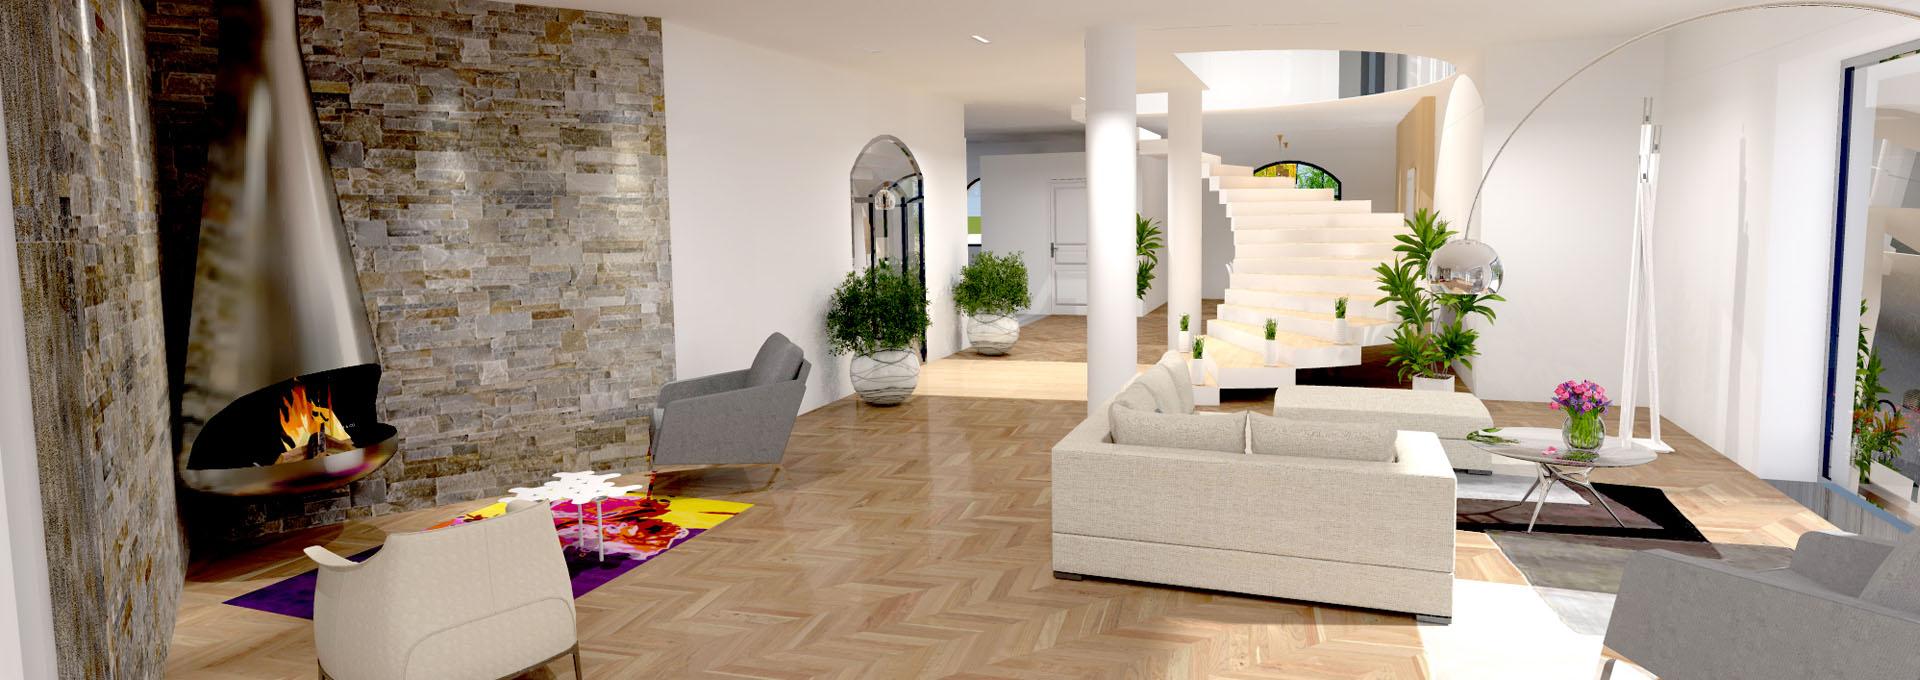 grand salon luxe parement pierre cheminee suspendu agence avous